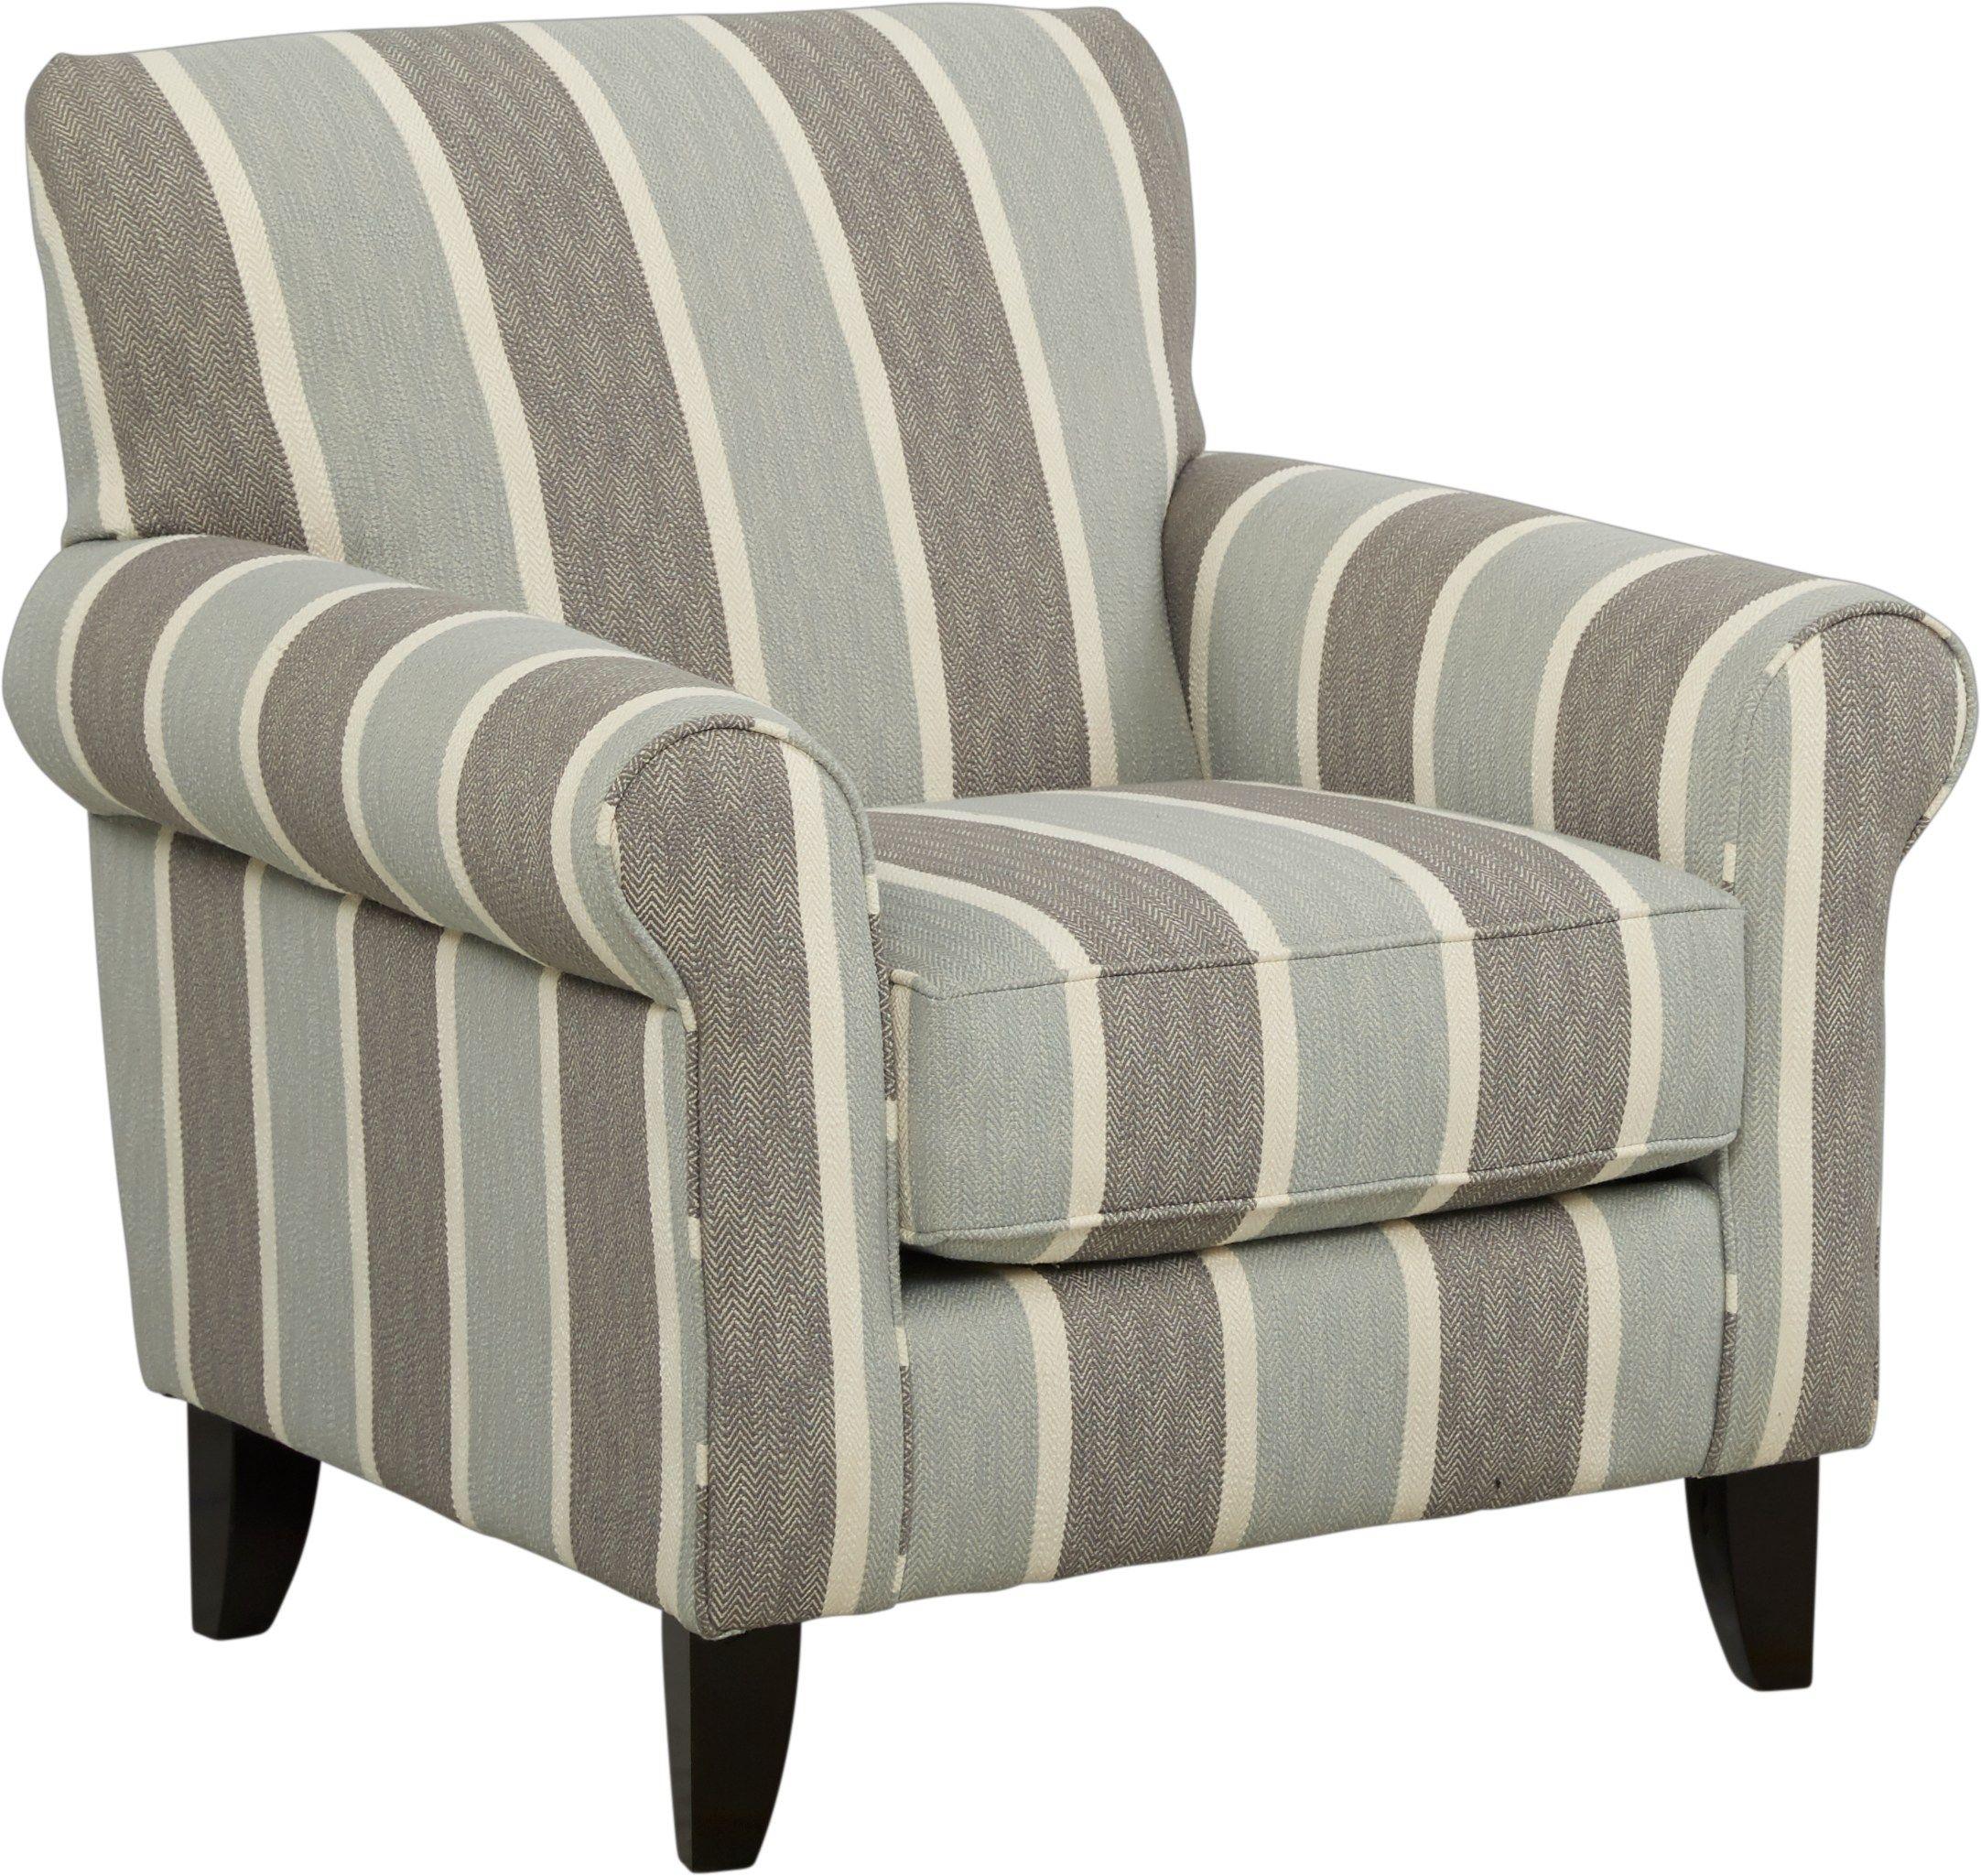 Pennington Blue Striped Accent Chair Stripe Accent Chair Accent Chairs For Living Room Furniture